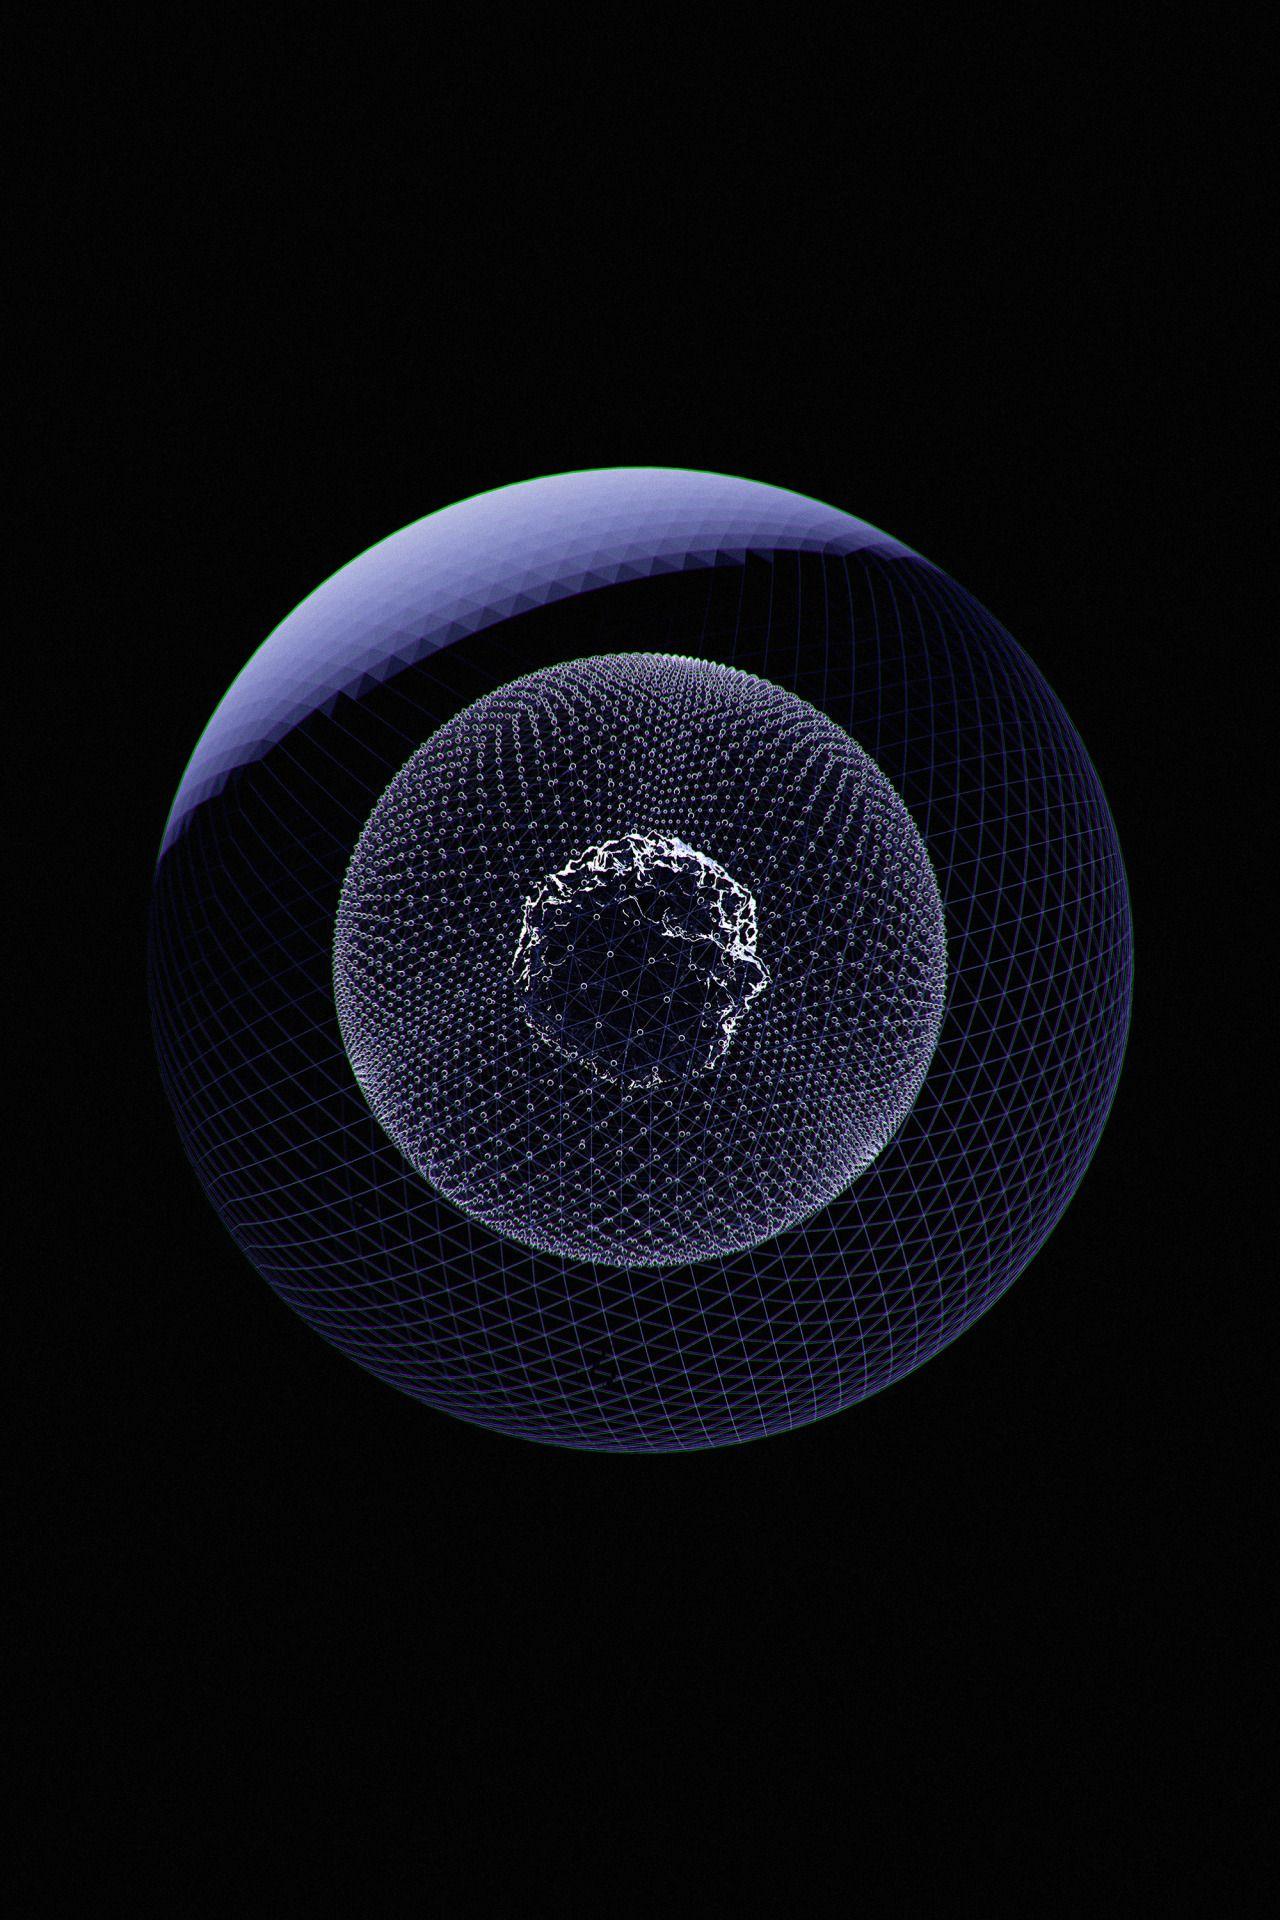 Neuro Studio Clement Balavoine Texture Images Graphic Design Background Templates Mathematics Art